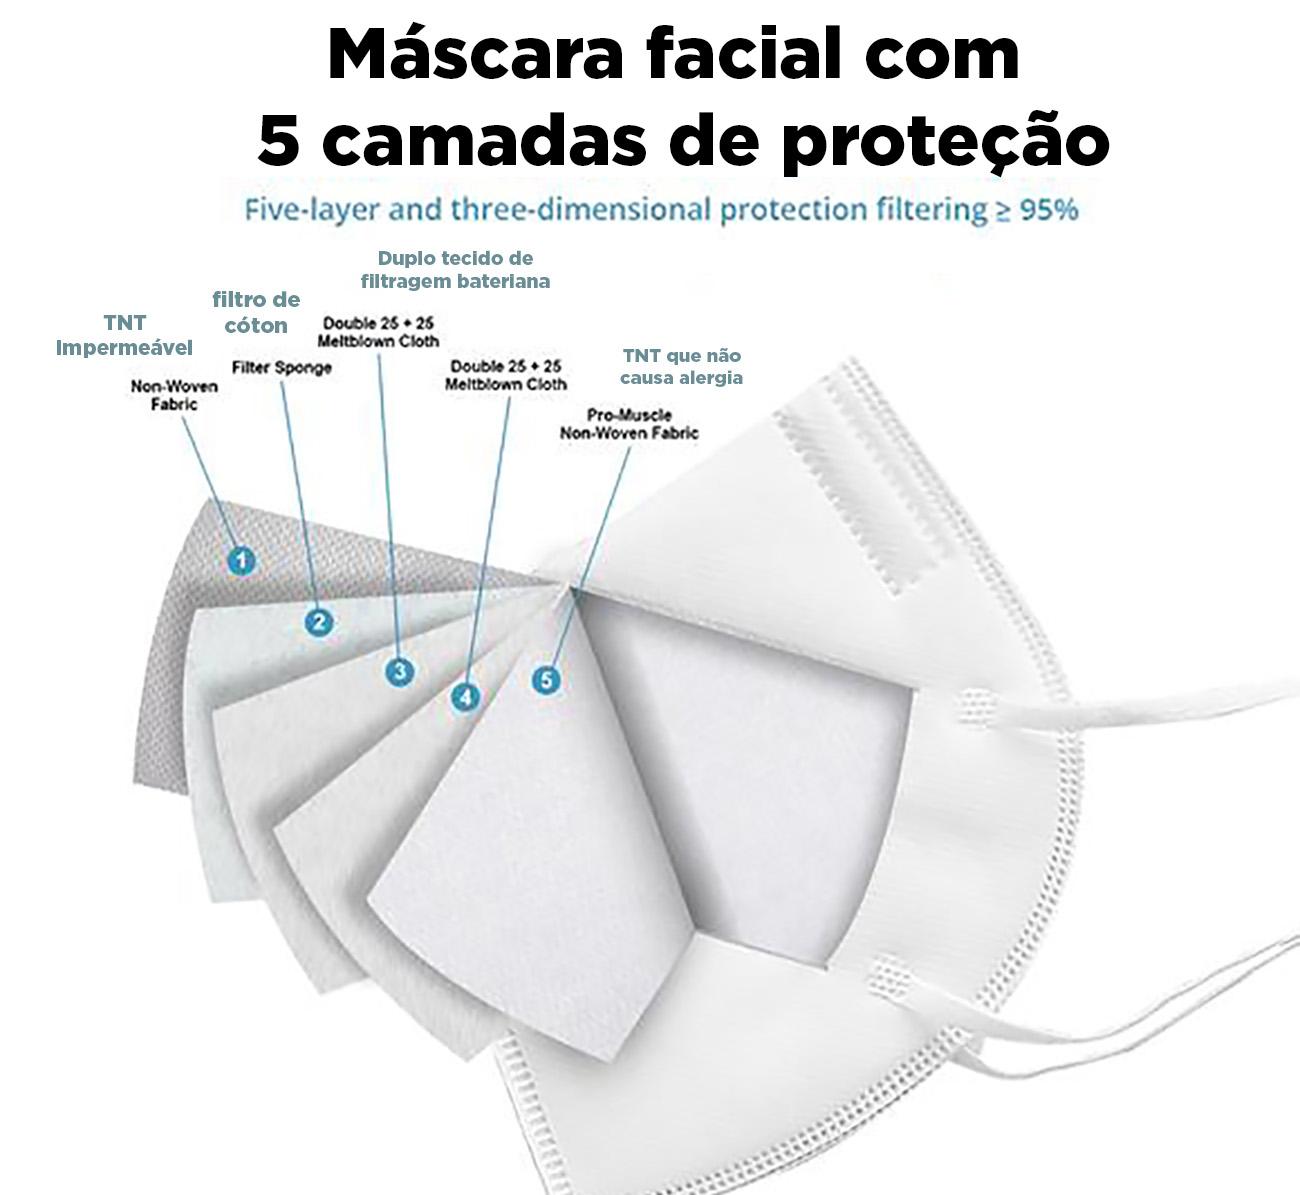 Máscara Respirador PFF2 / N95 preta 50 unidades 5 camadas meltblow BFE 98% + feltro de coton + tnt spunbond hospitalar hipoalergenico